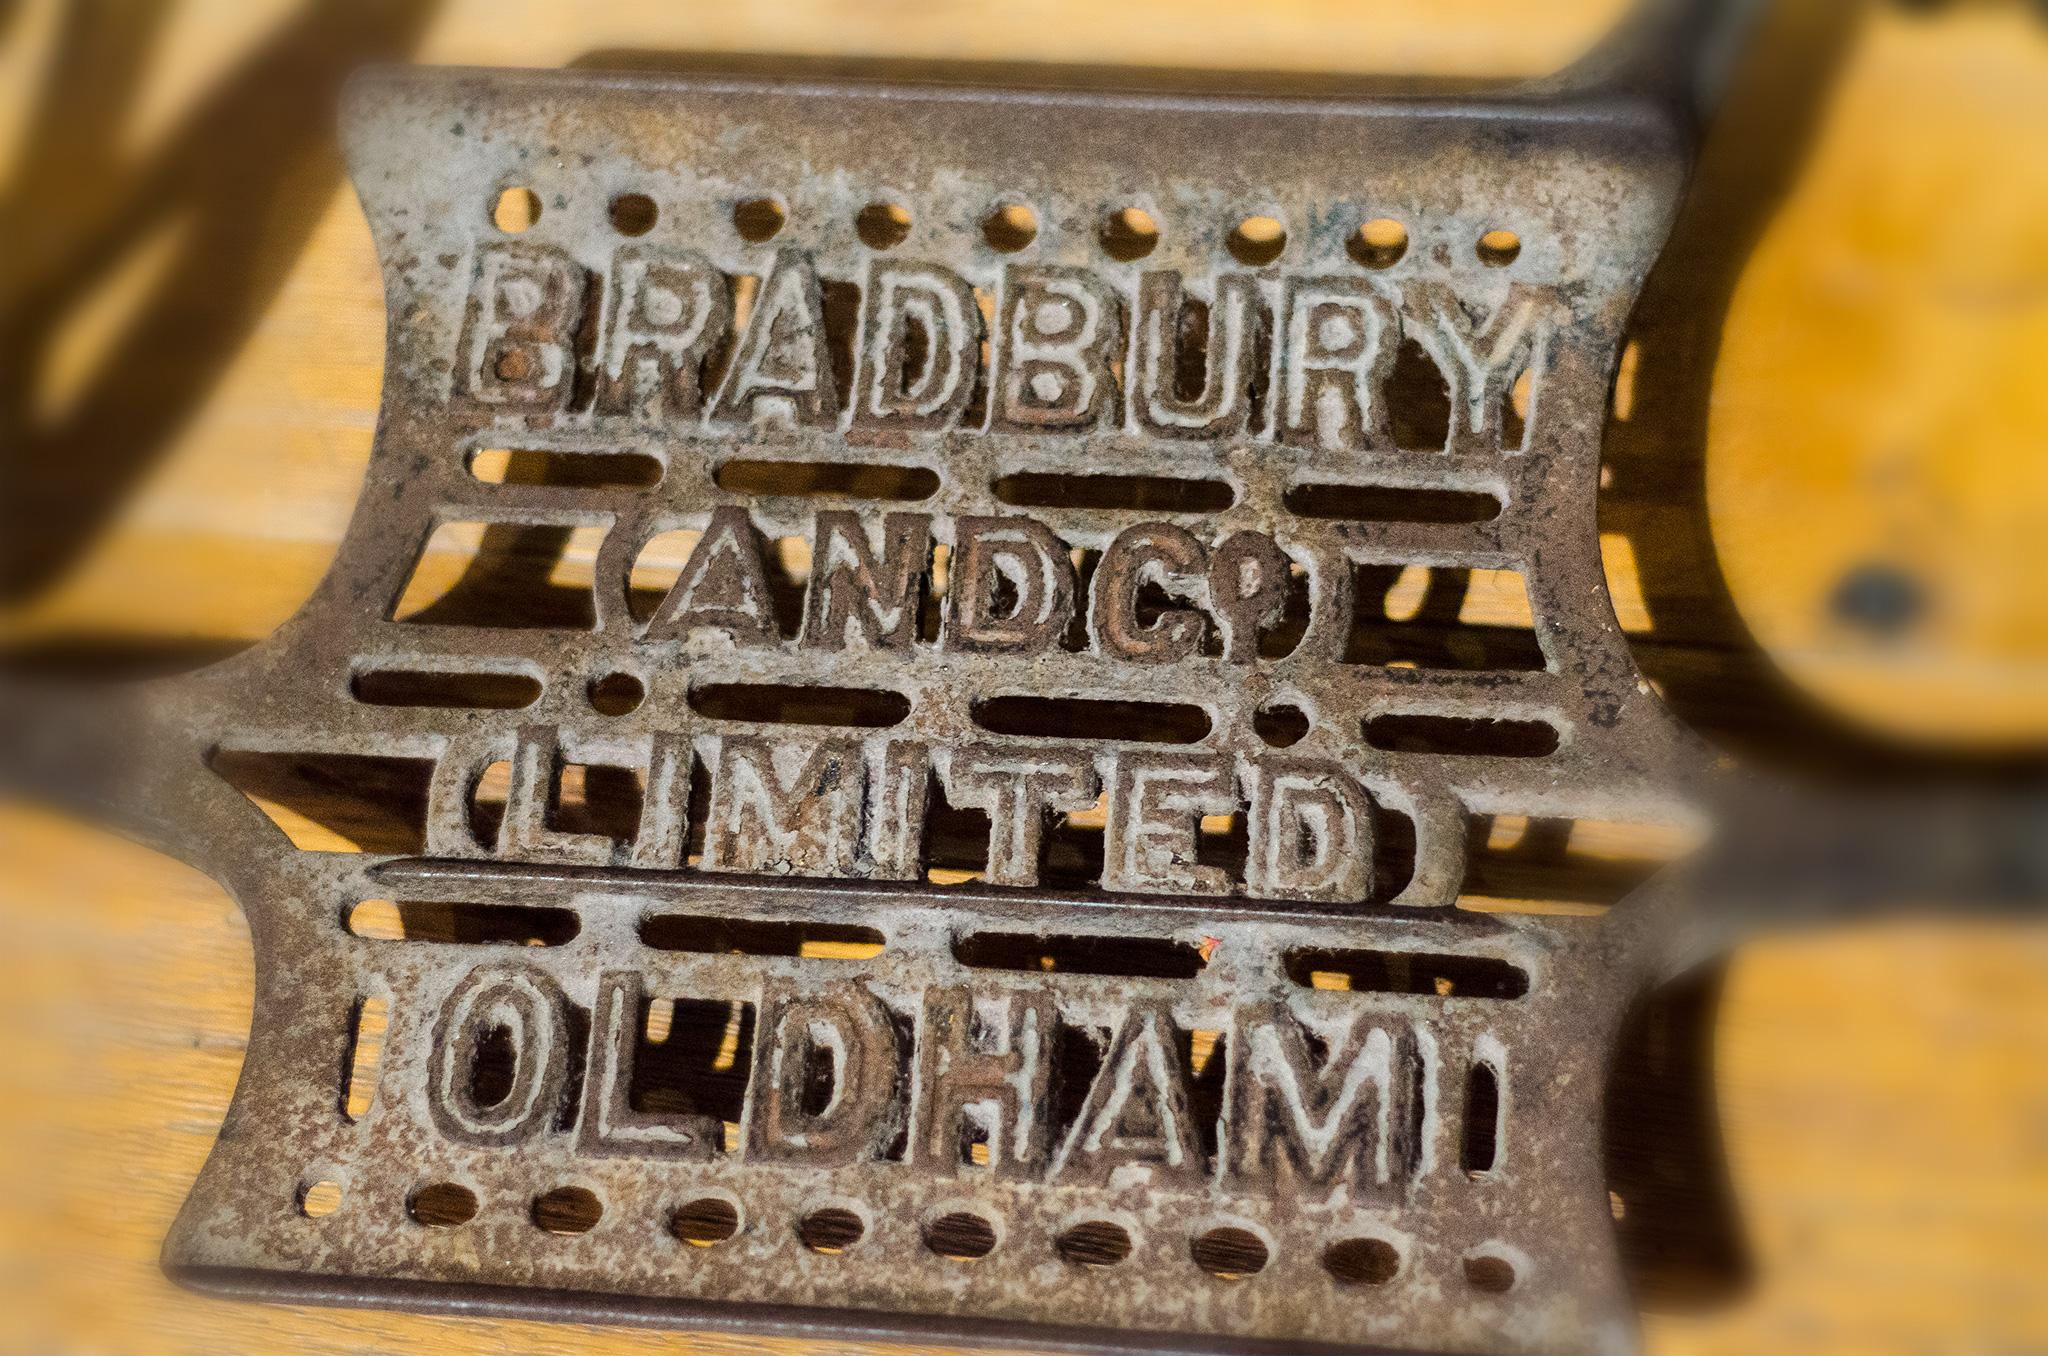 dublin bradbury and company oldham